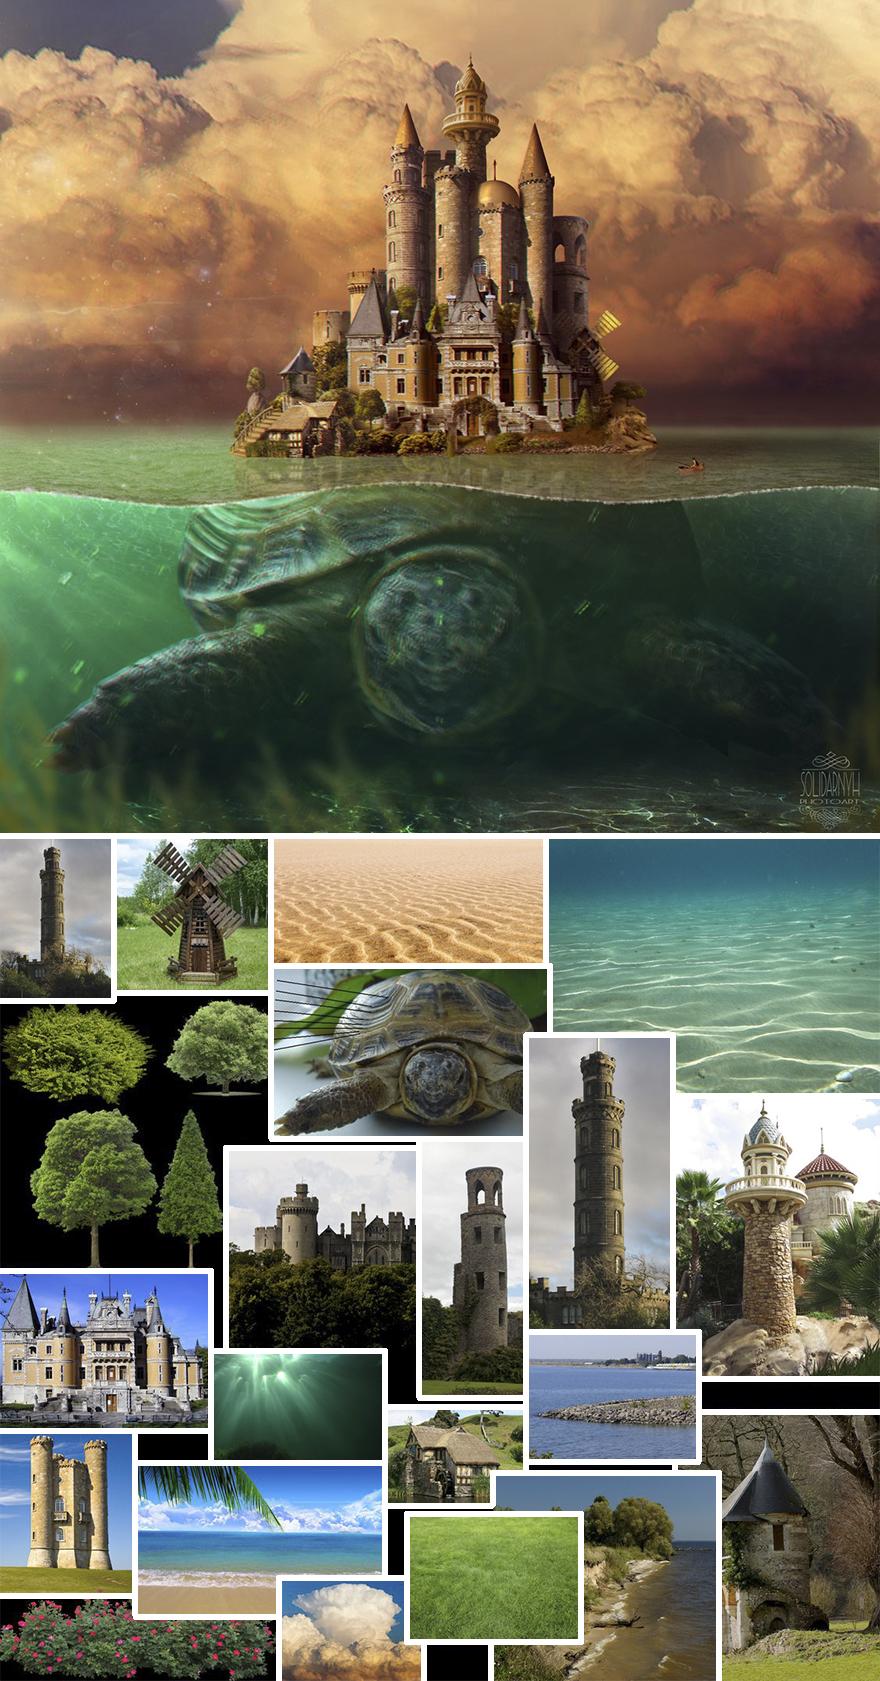 Photoshop composition, manipulation master skills - 16